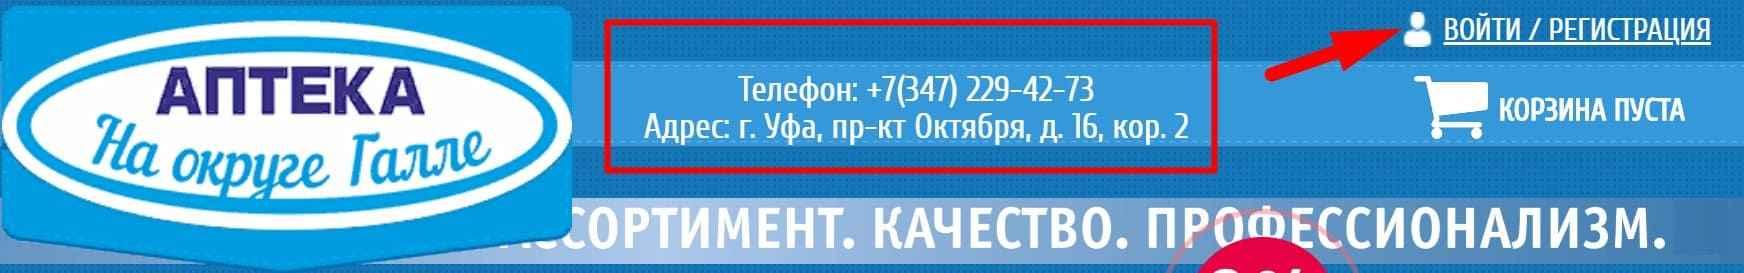 aptekanagalle.ru личный кабинет